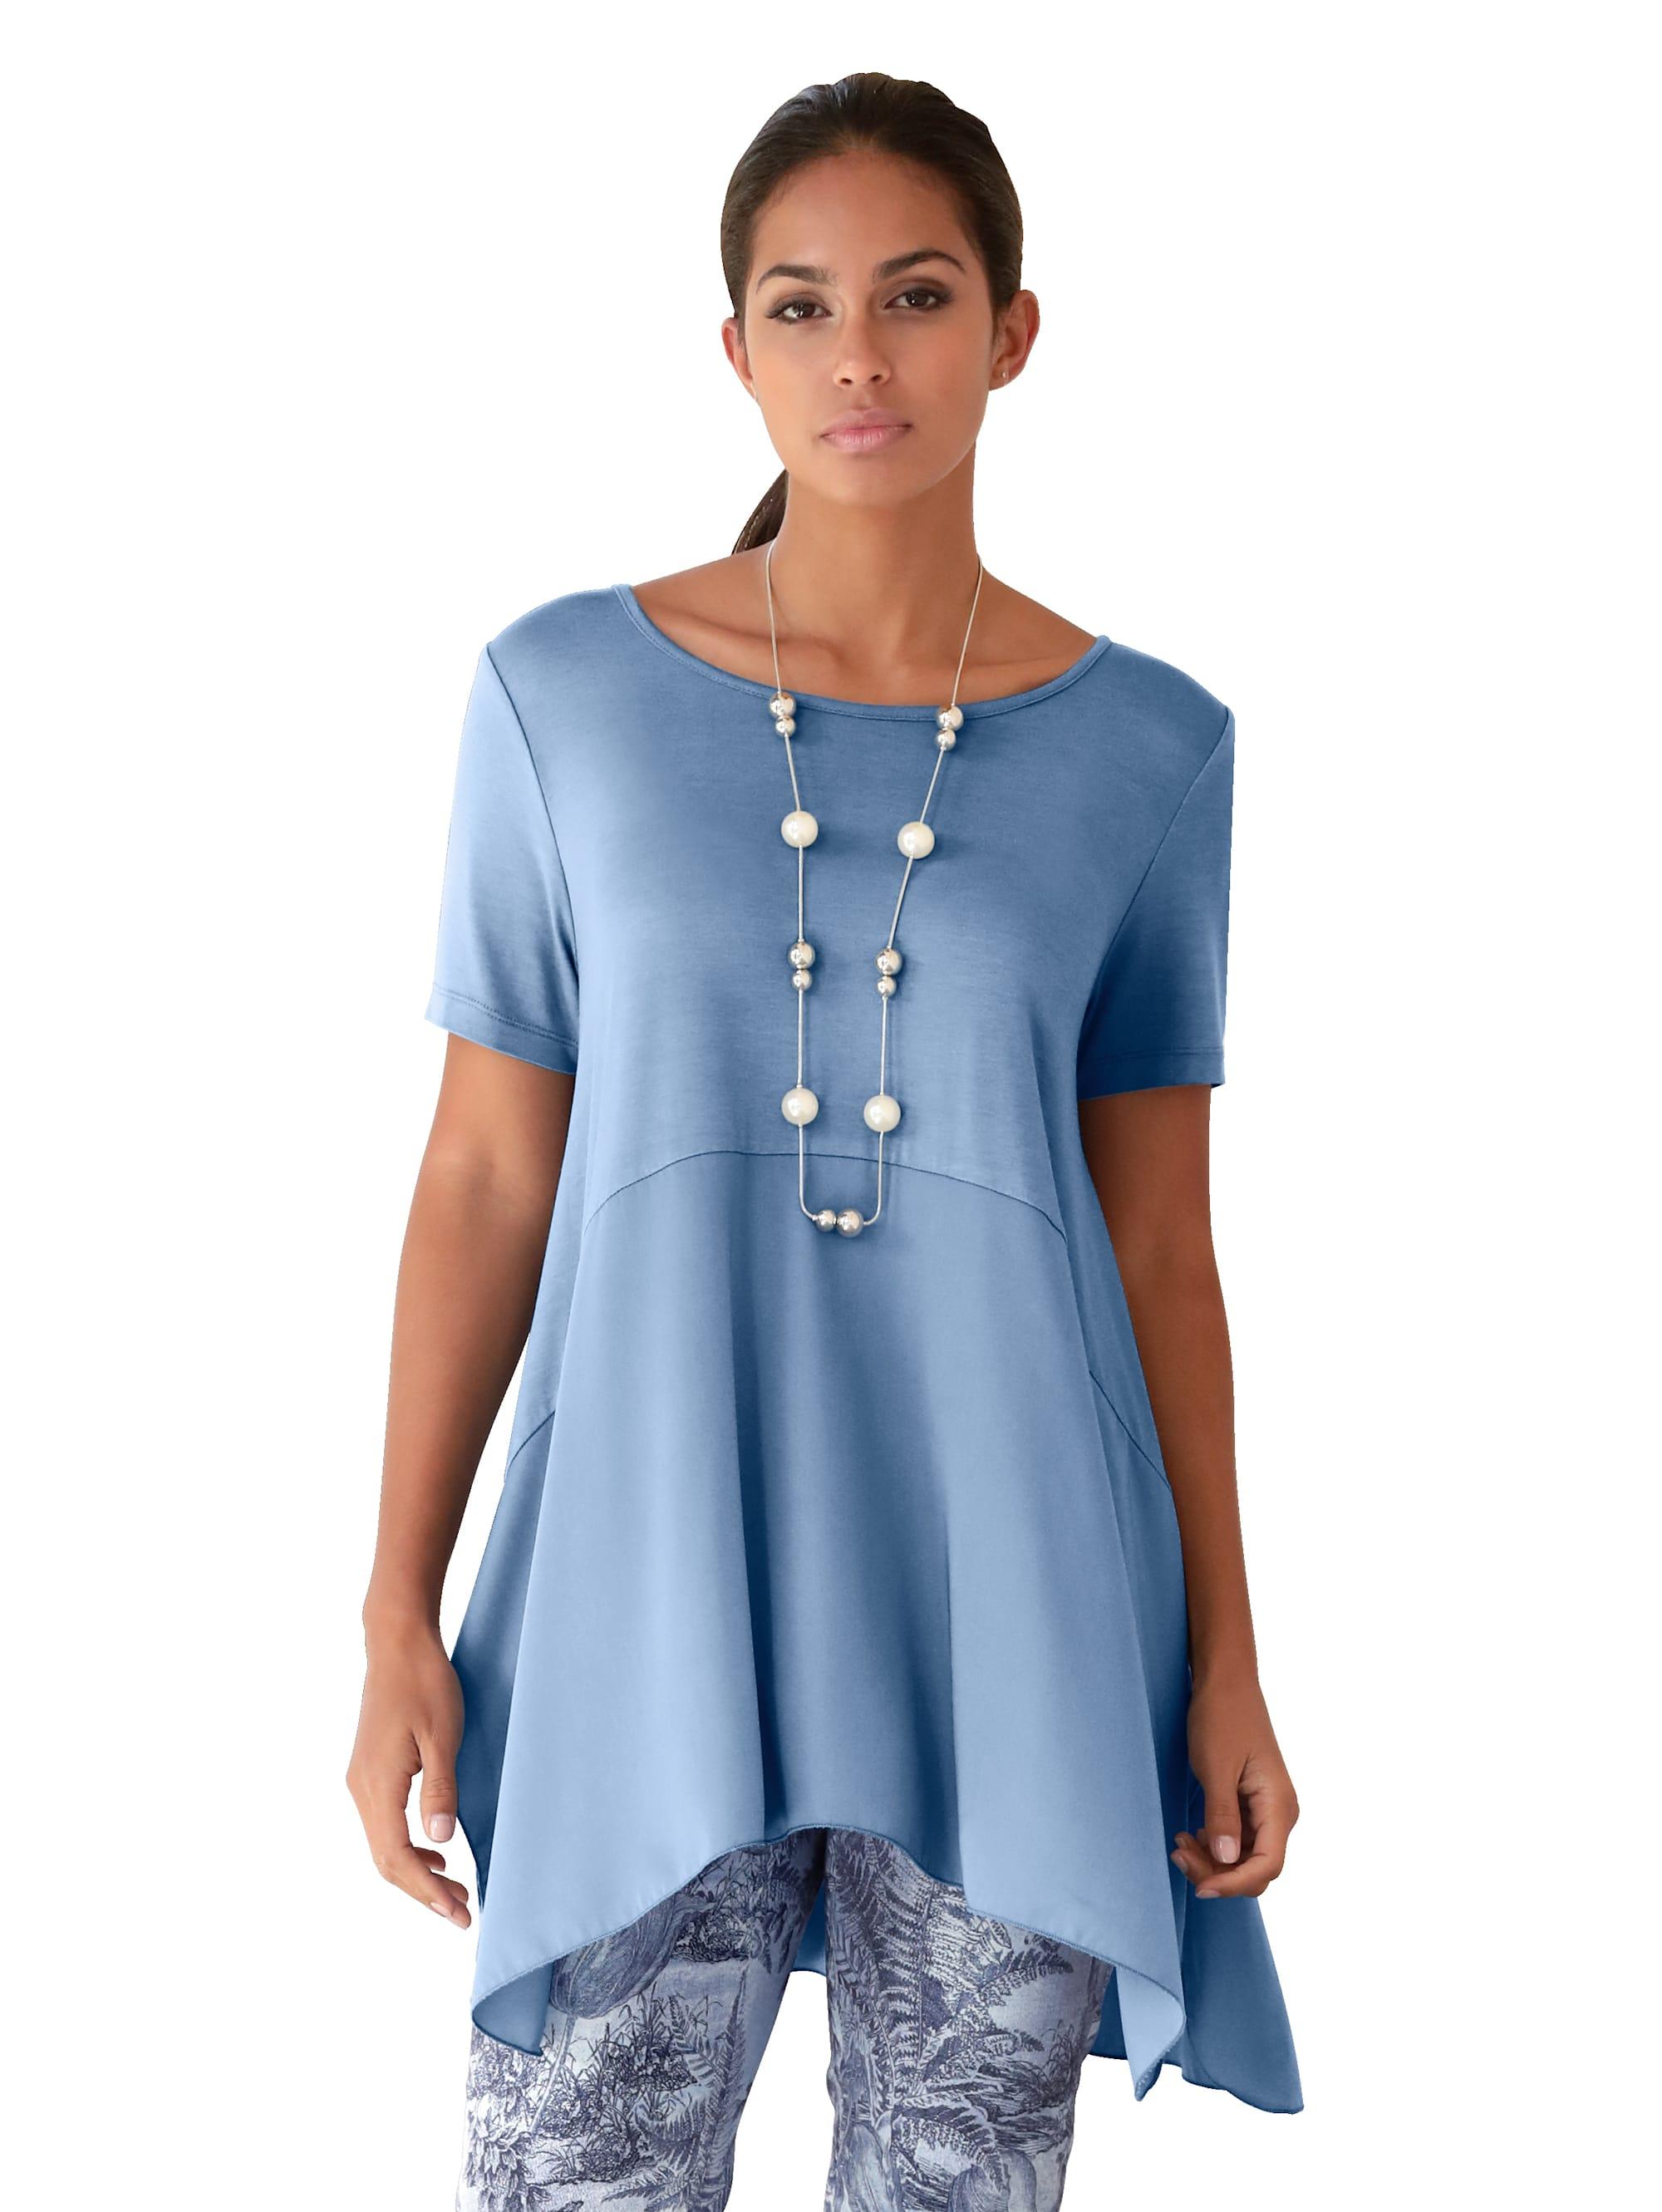 AMY VERMONT Shirt mit Zipfelsaum g6g5j Kbzqg